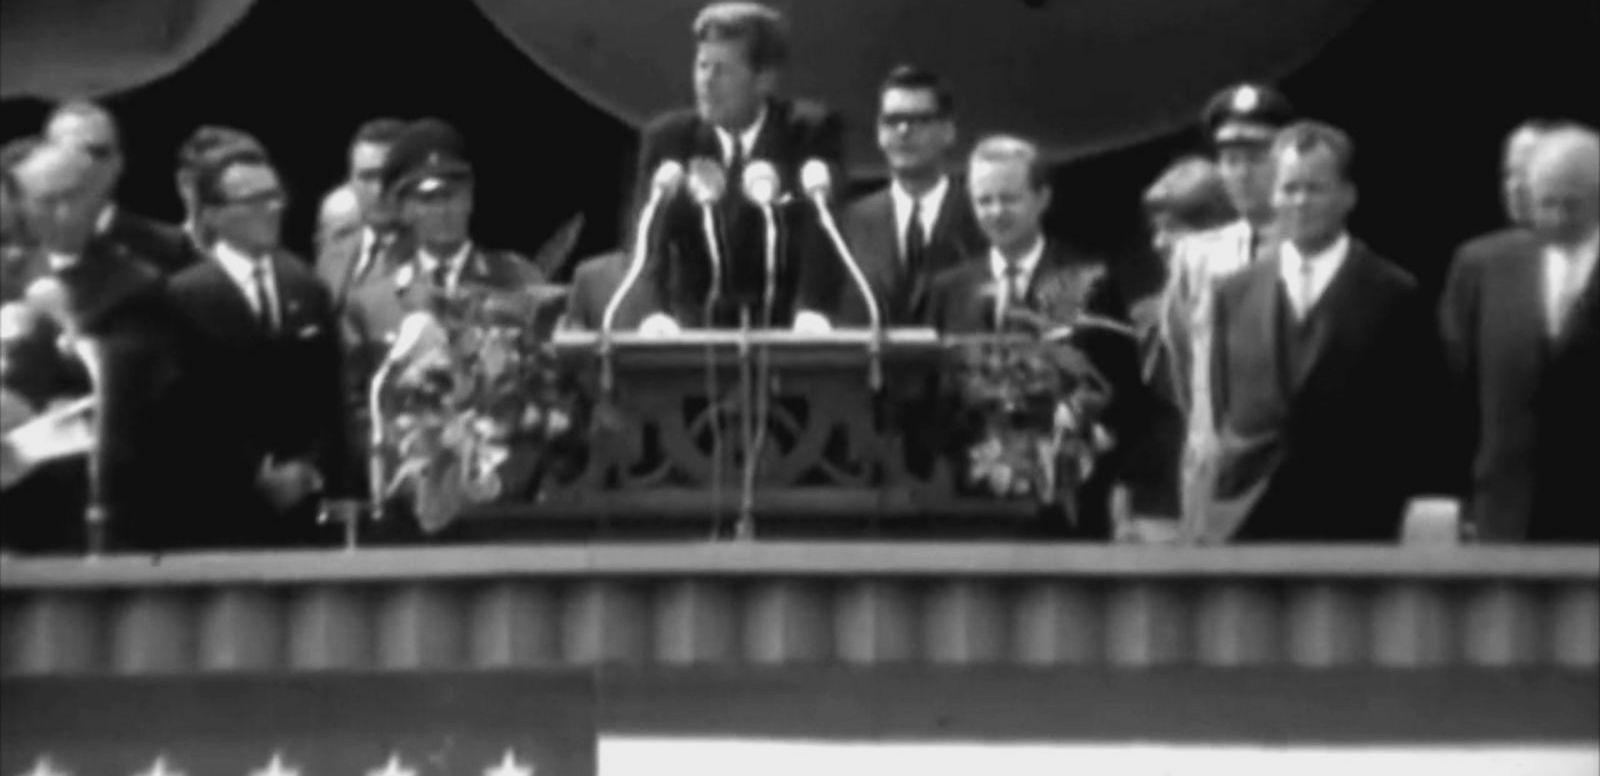 VIDEO: This Week in History: June 26-July 2